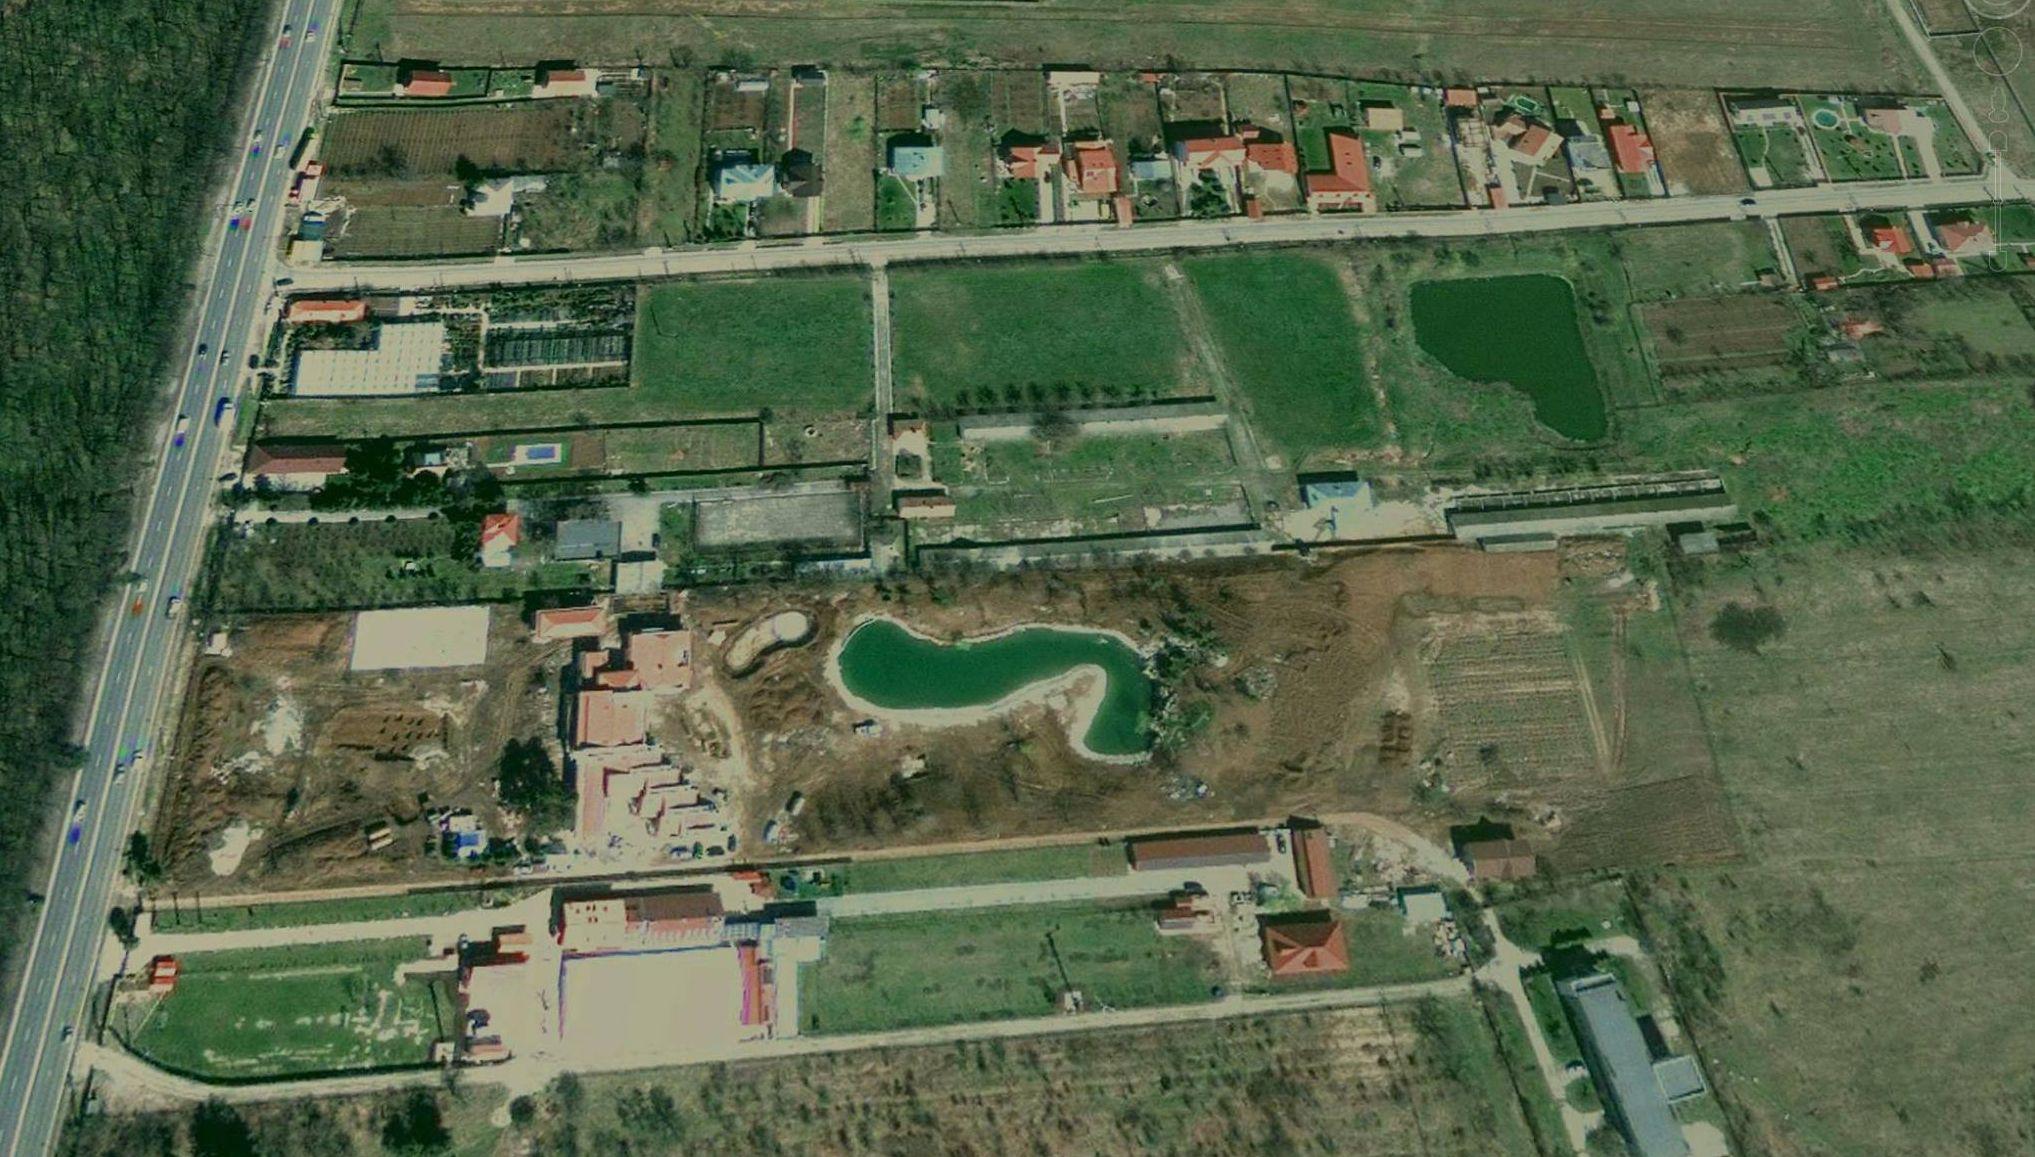 adelaparvu.com despre gradina amenjata de arh Dragos Isacescu, Foto Google Earth 1 (3)